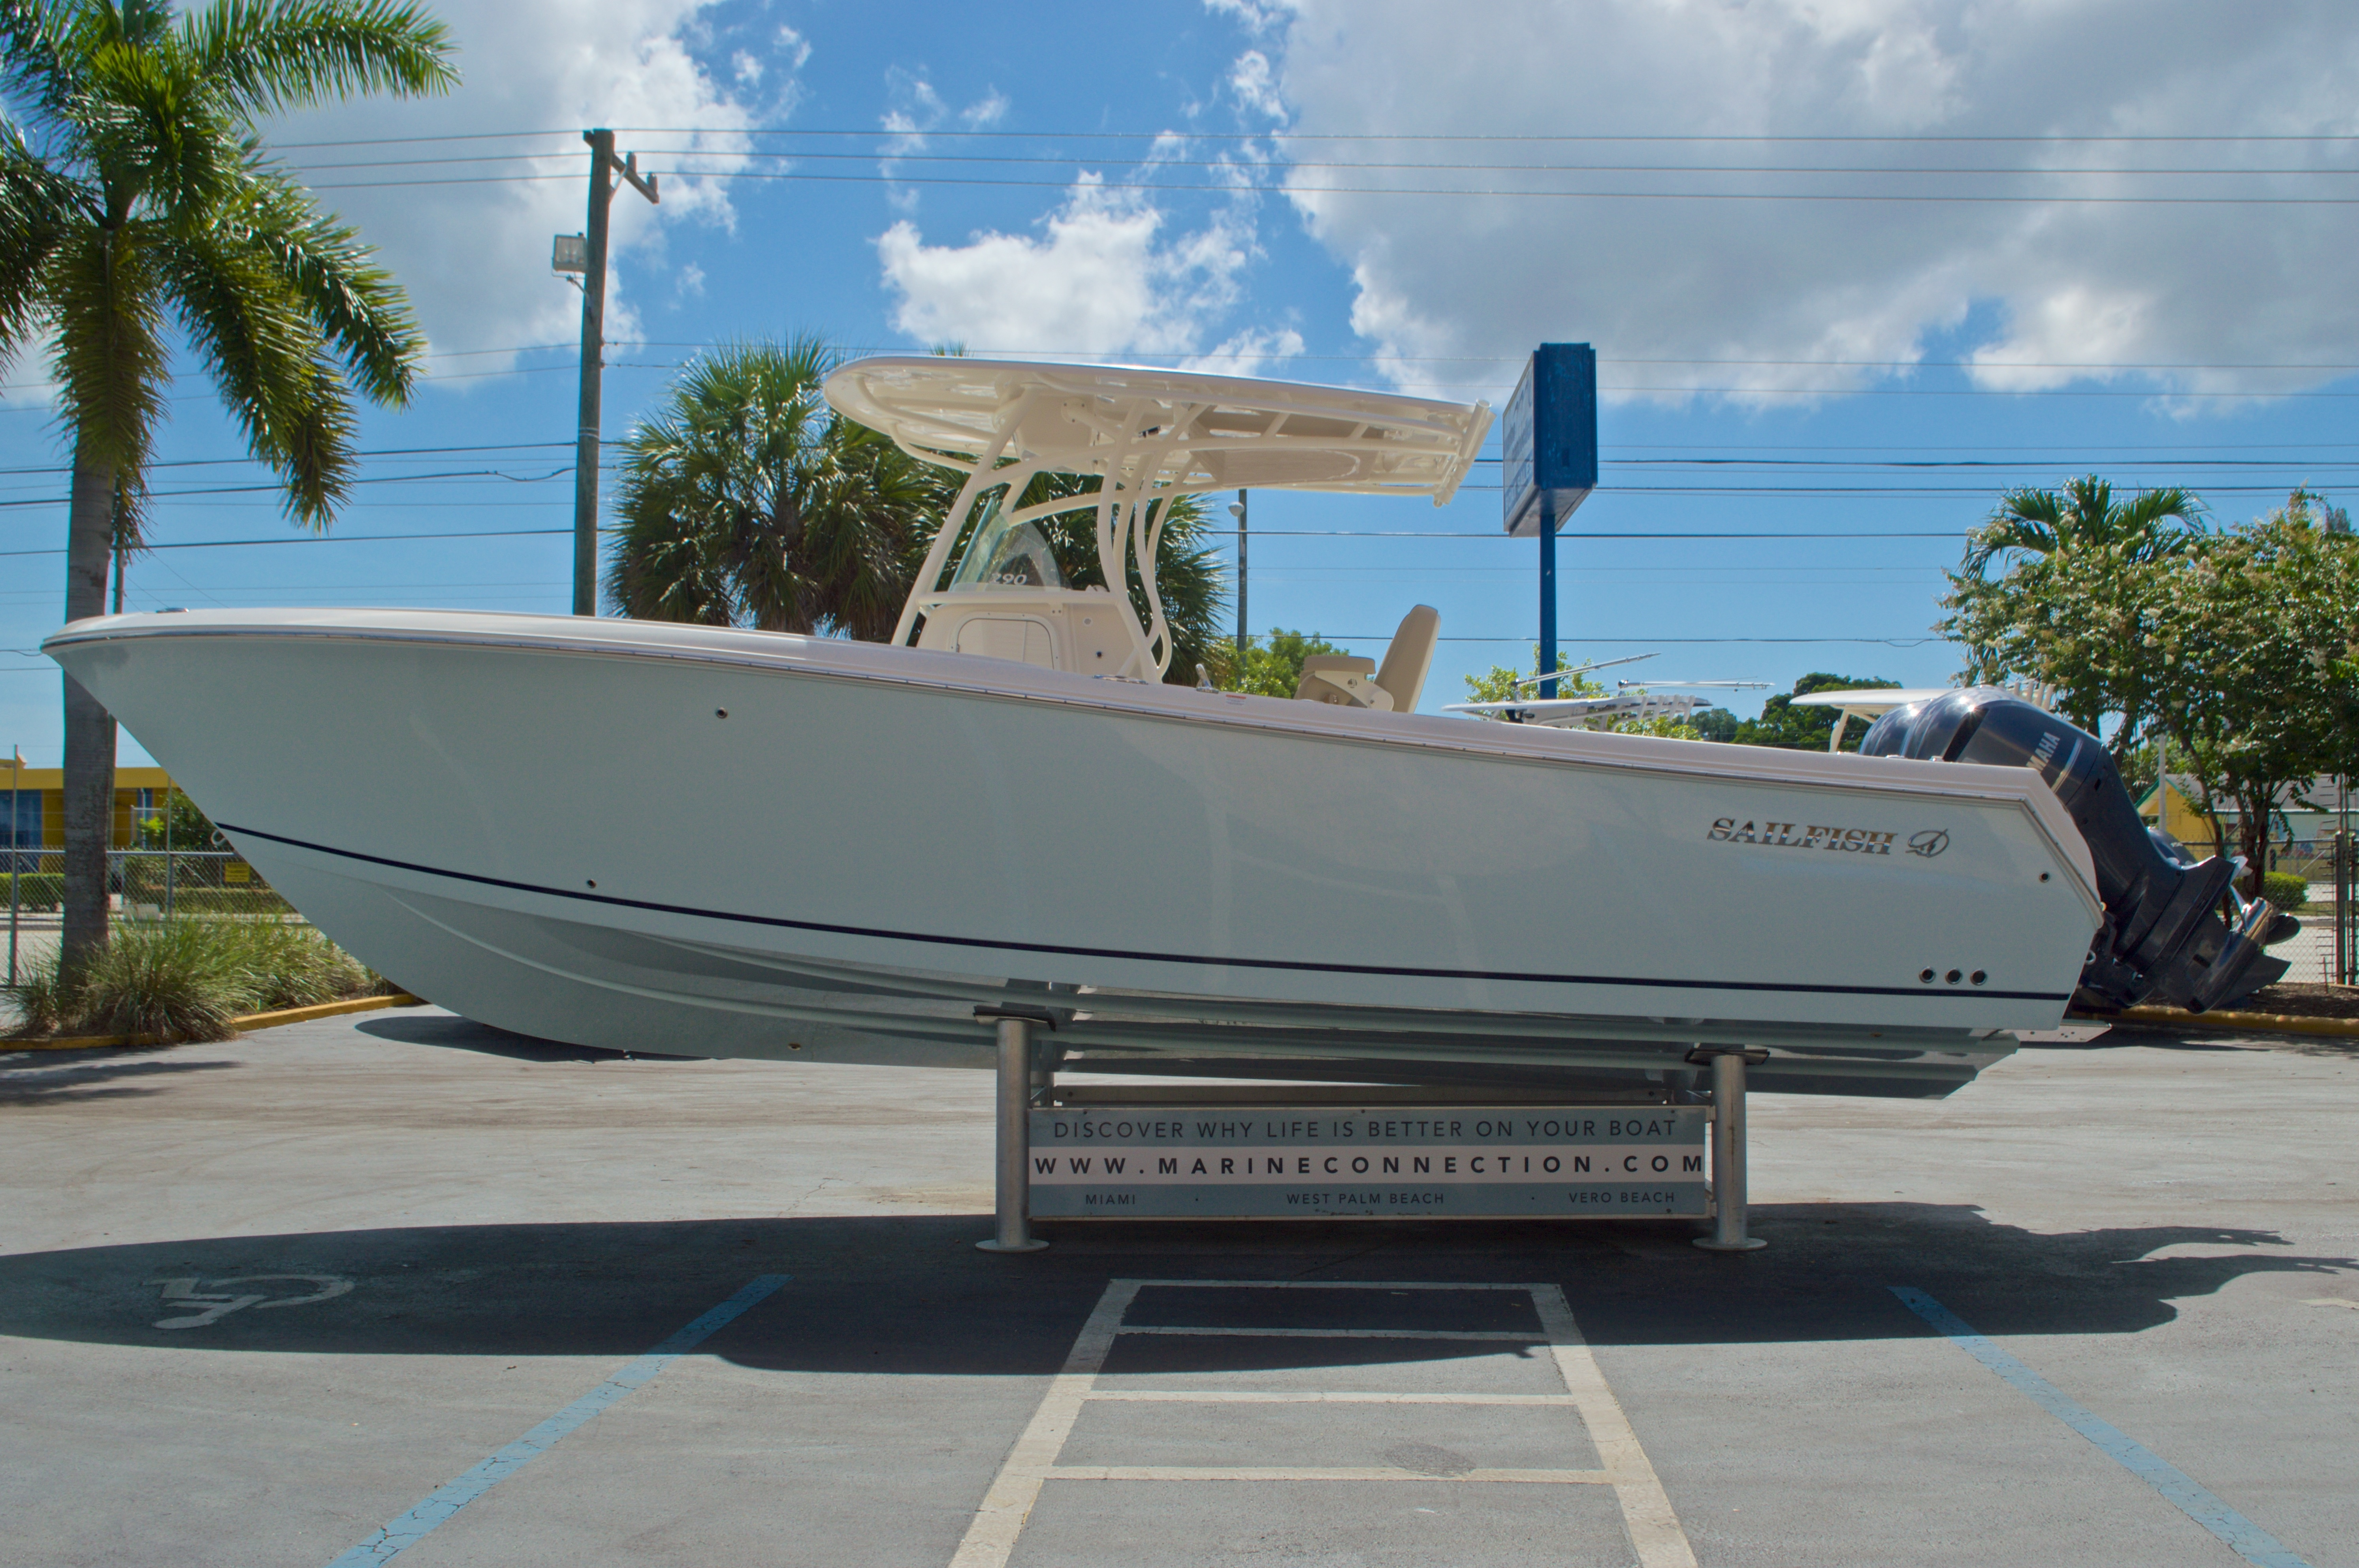 Thumbnail 5 for New 2017 Sailfish 290 CC Center Console boat for sale in Vero Beach, FL